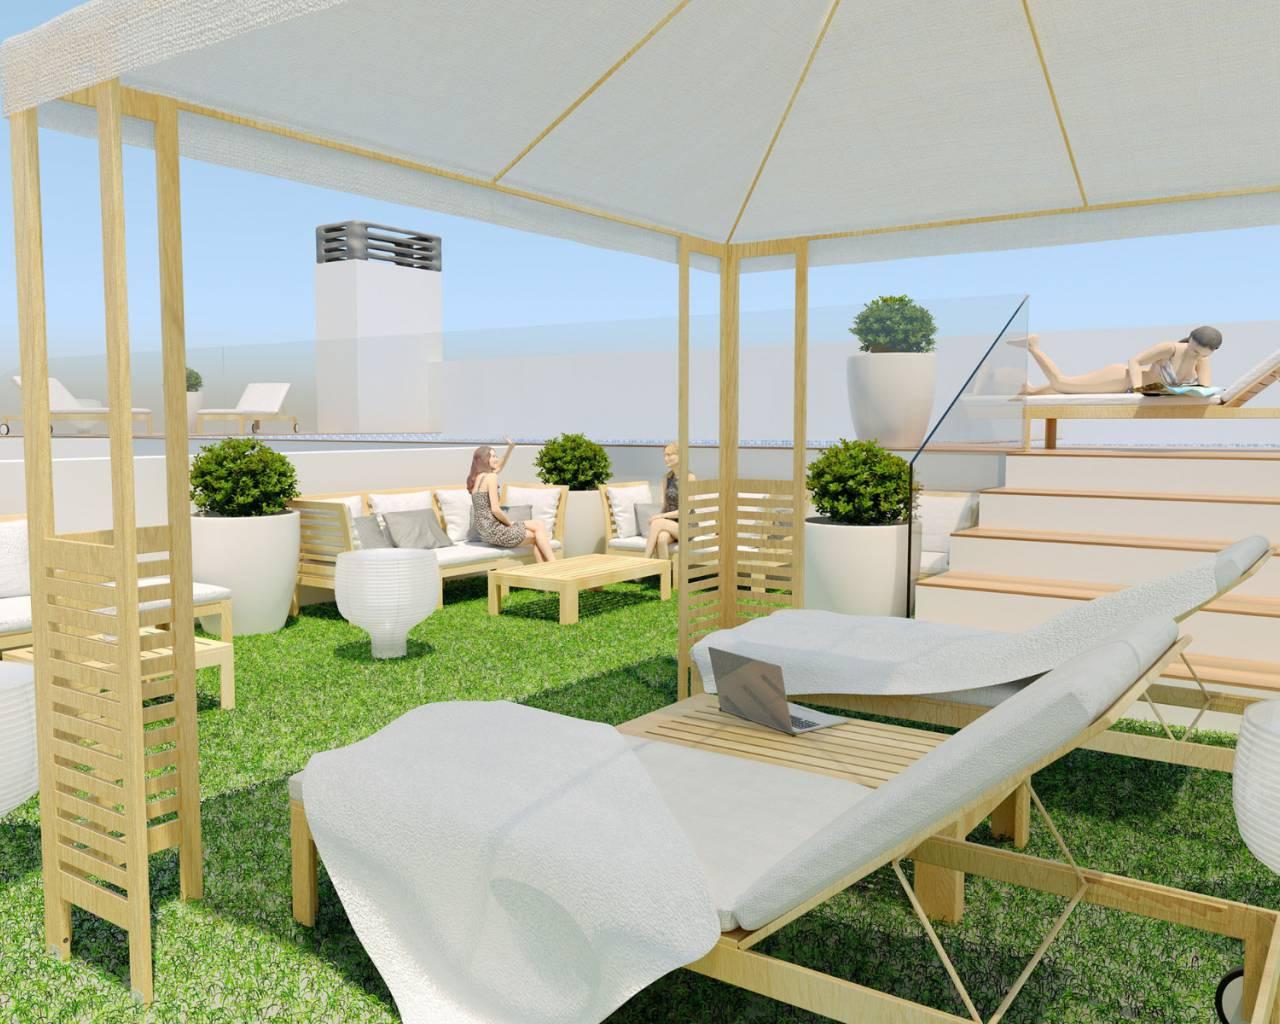 nieuwbouw-penthouse-torrevieja-playa-del-cura_2528_xl